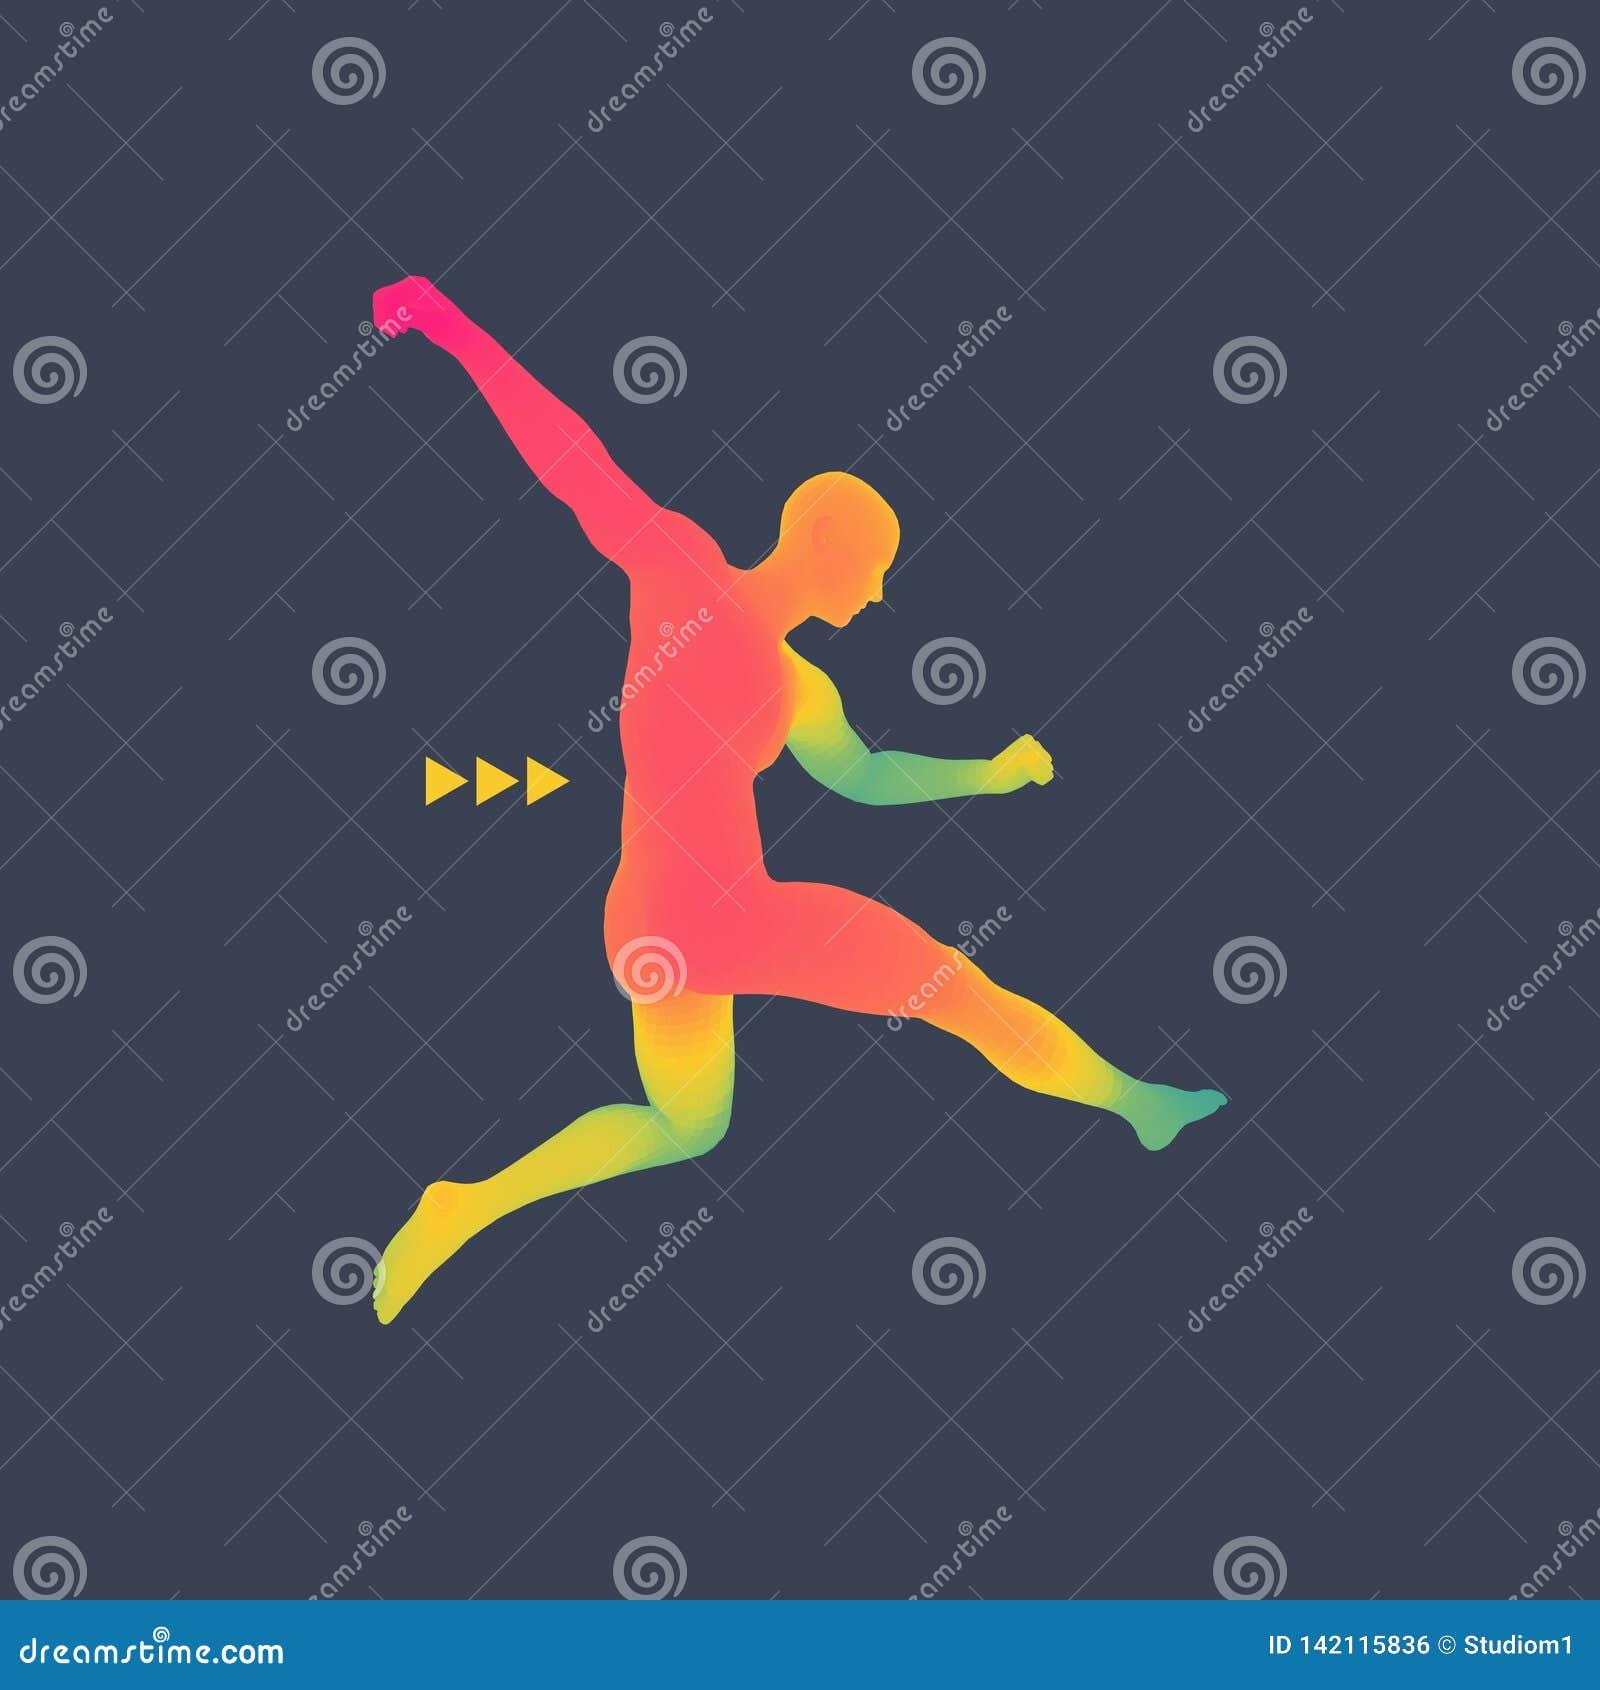 Football Player  Sports Concept  3D Model Of Man  Sport